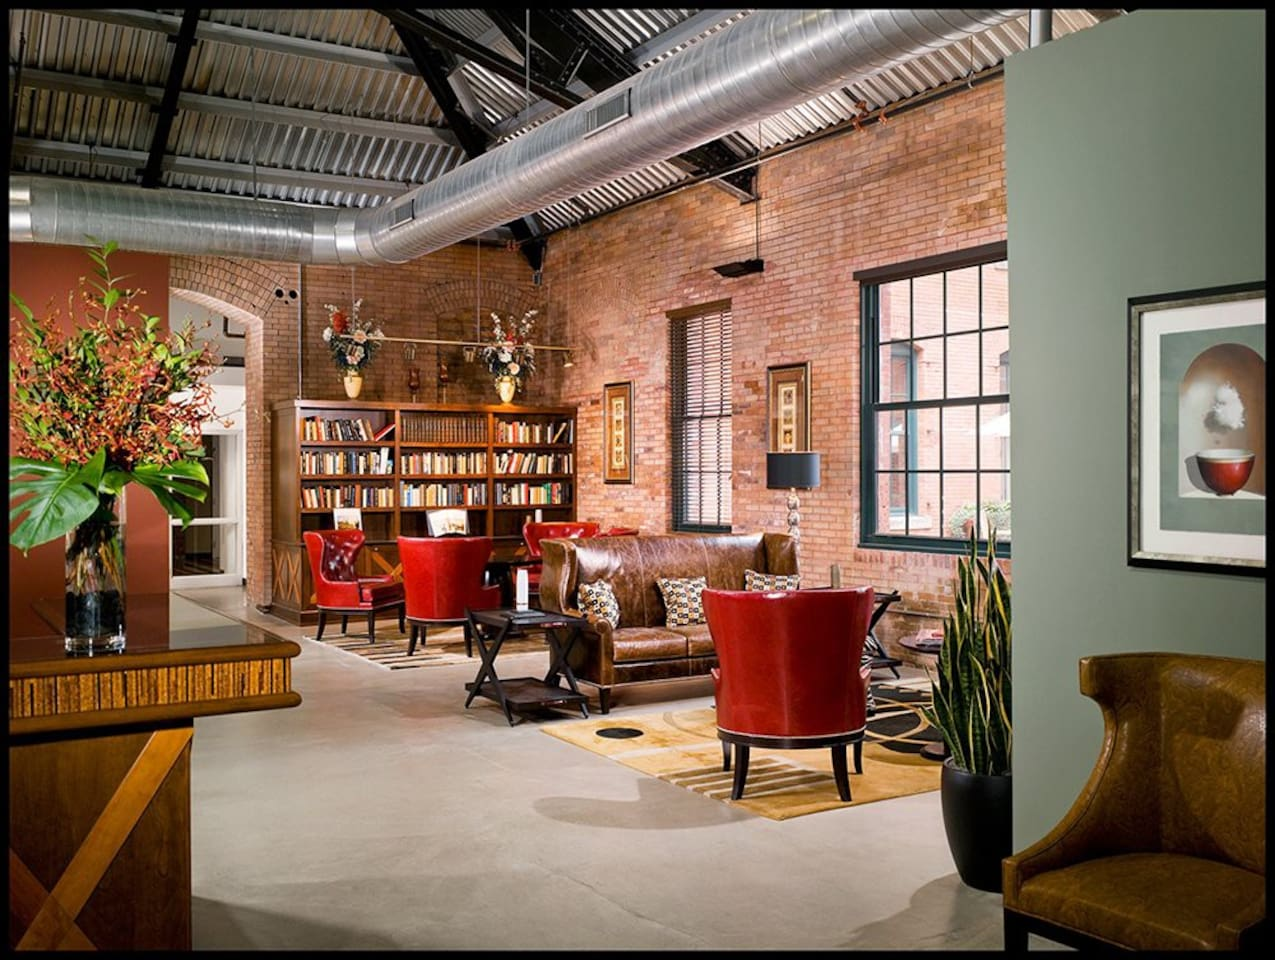 The lobby/sitting area.